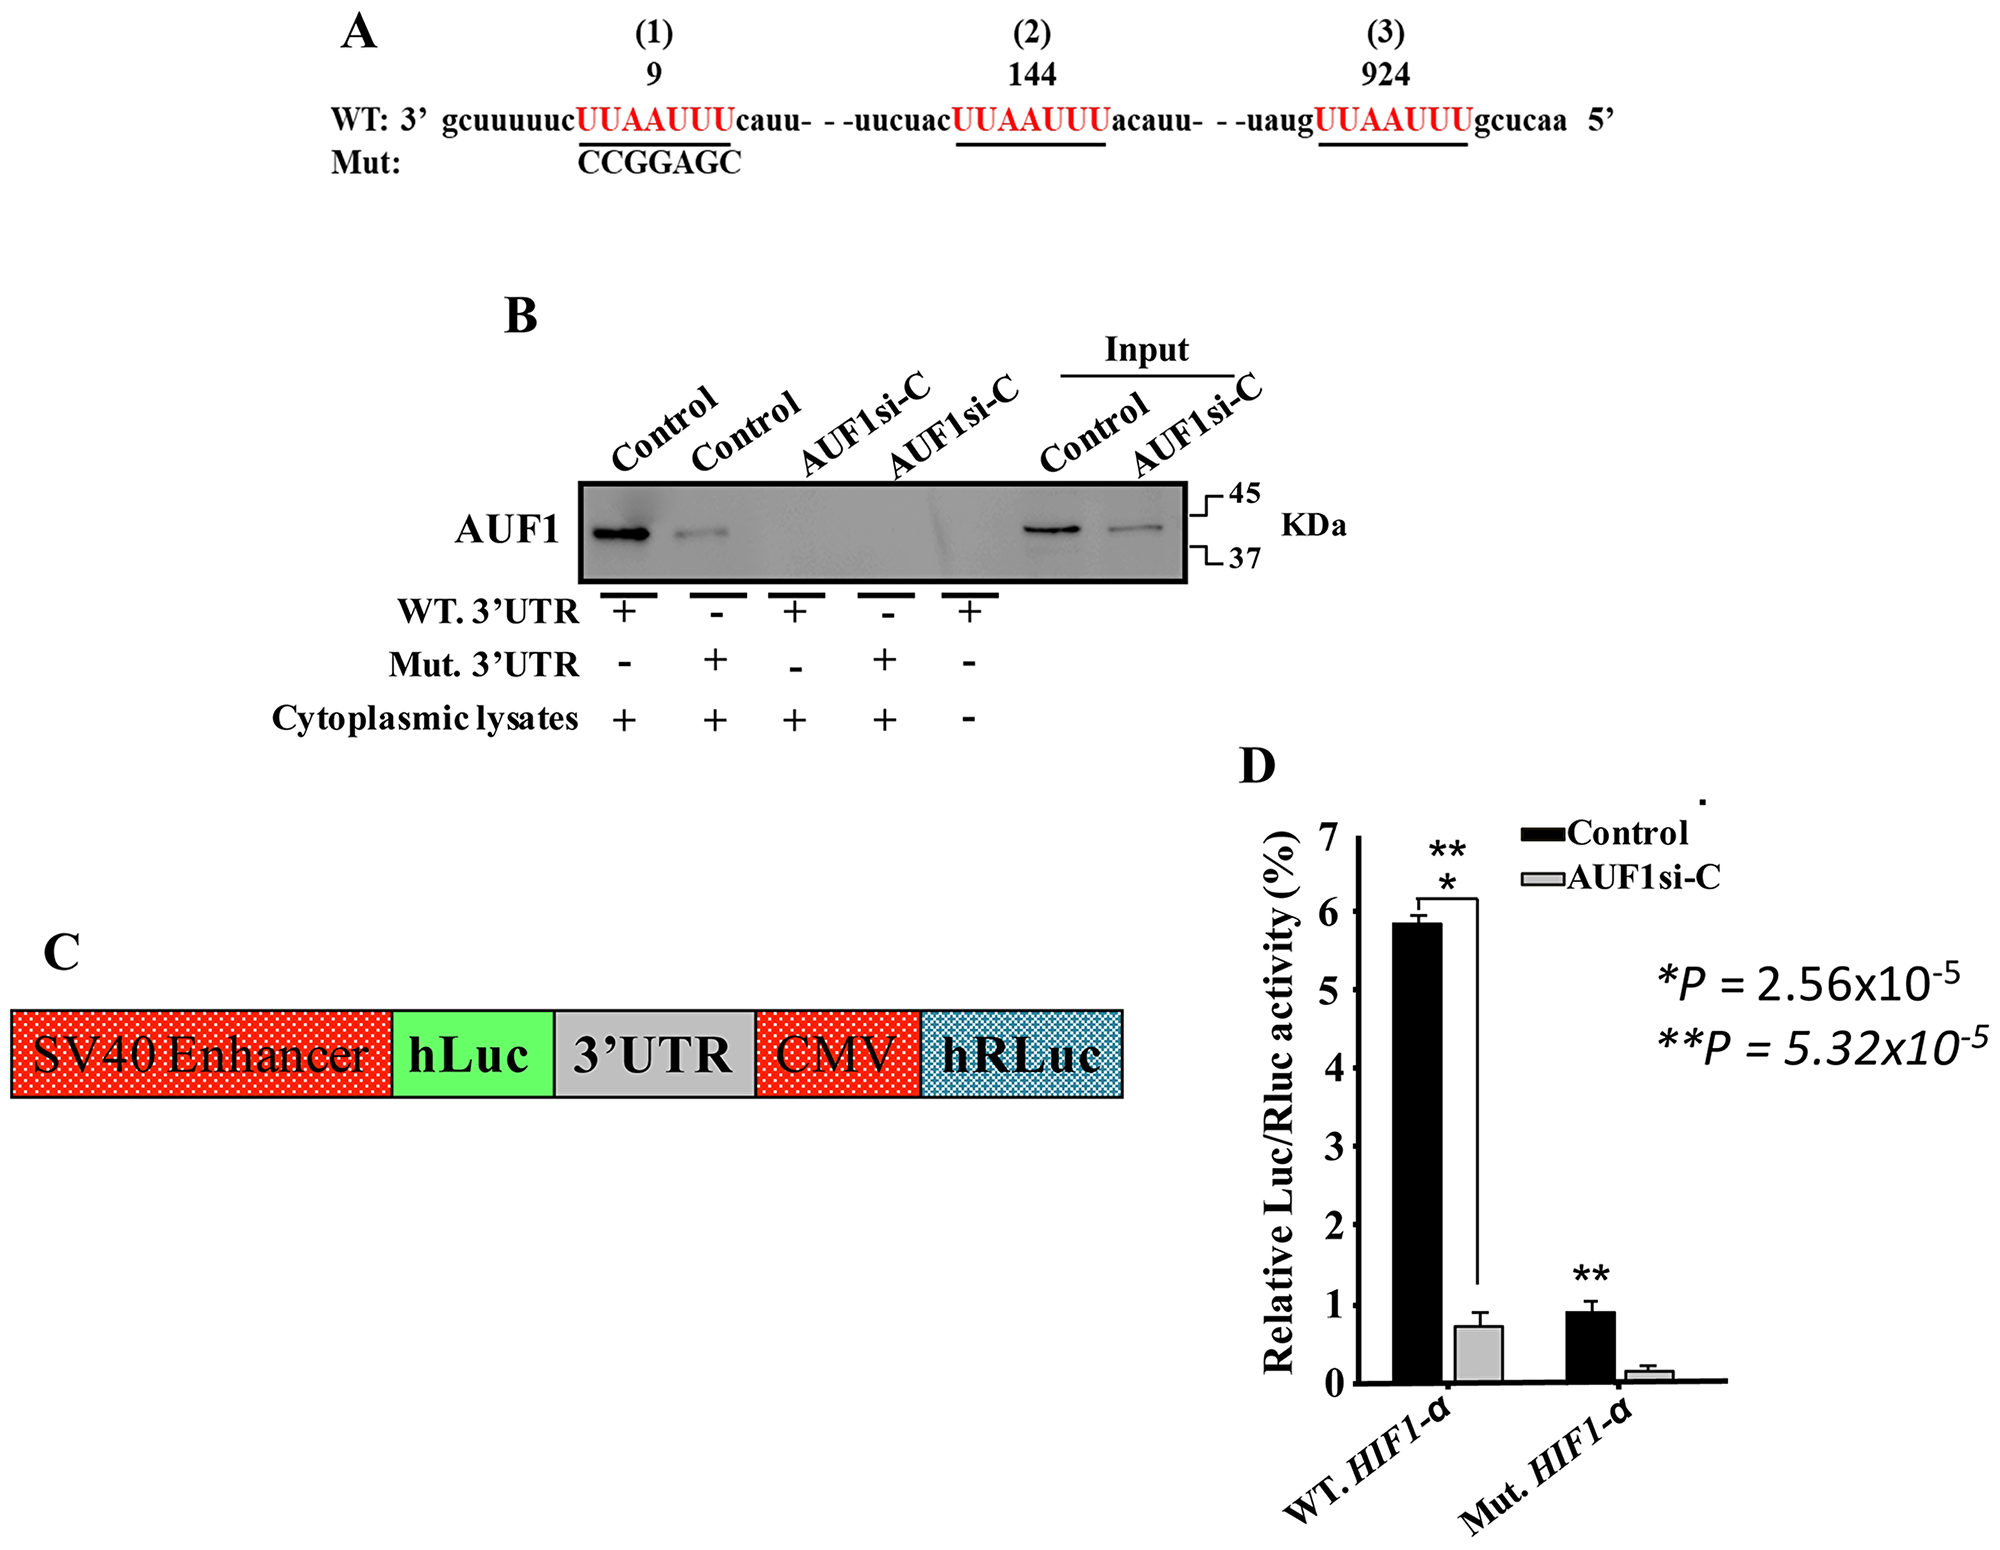 AUF1 binds to the HIF-1α 3'UTR.